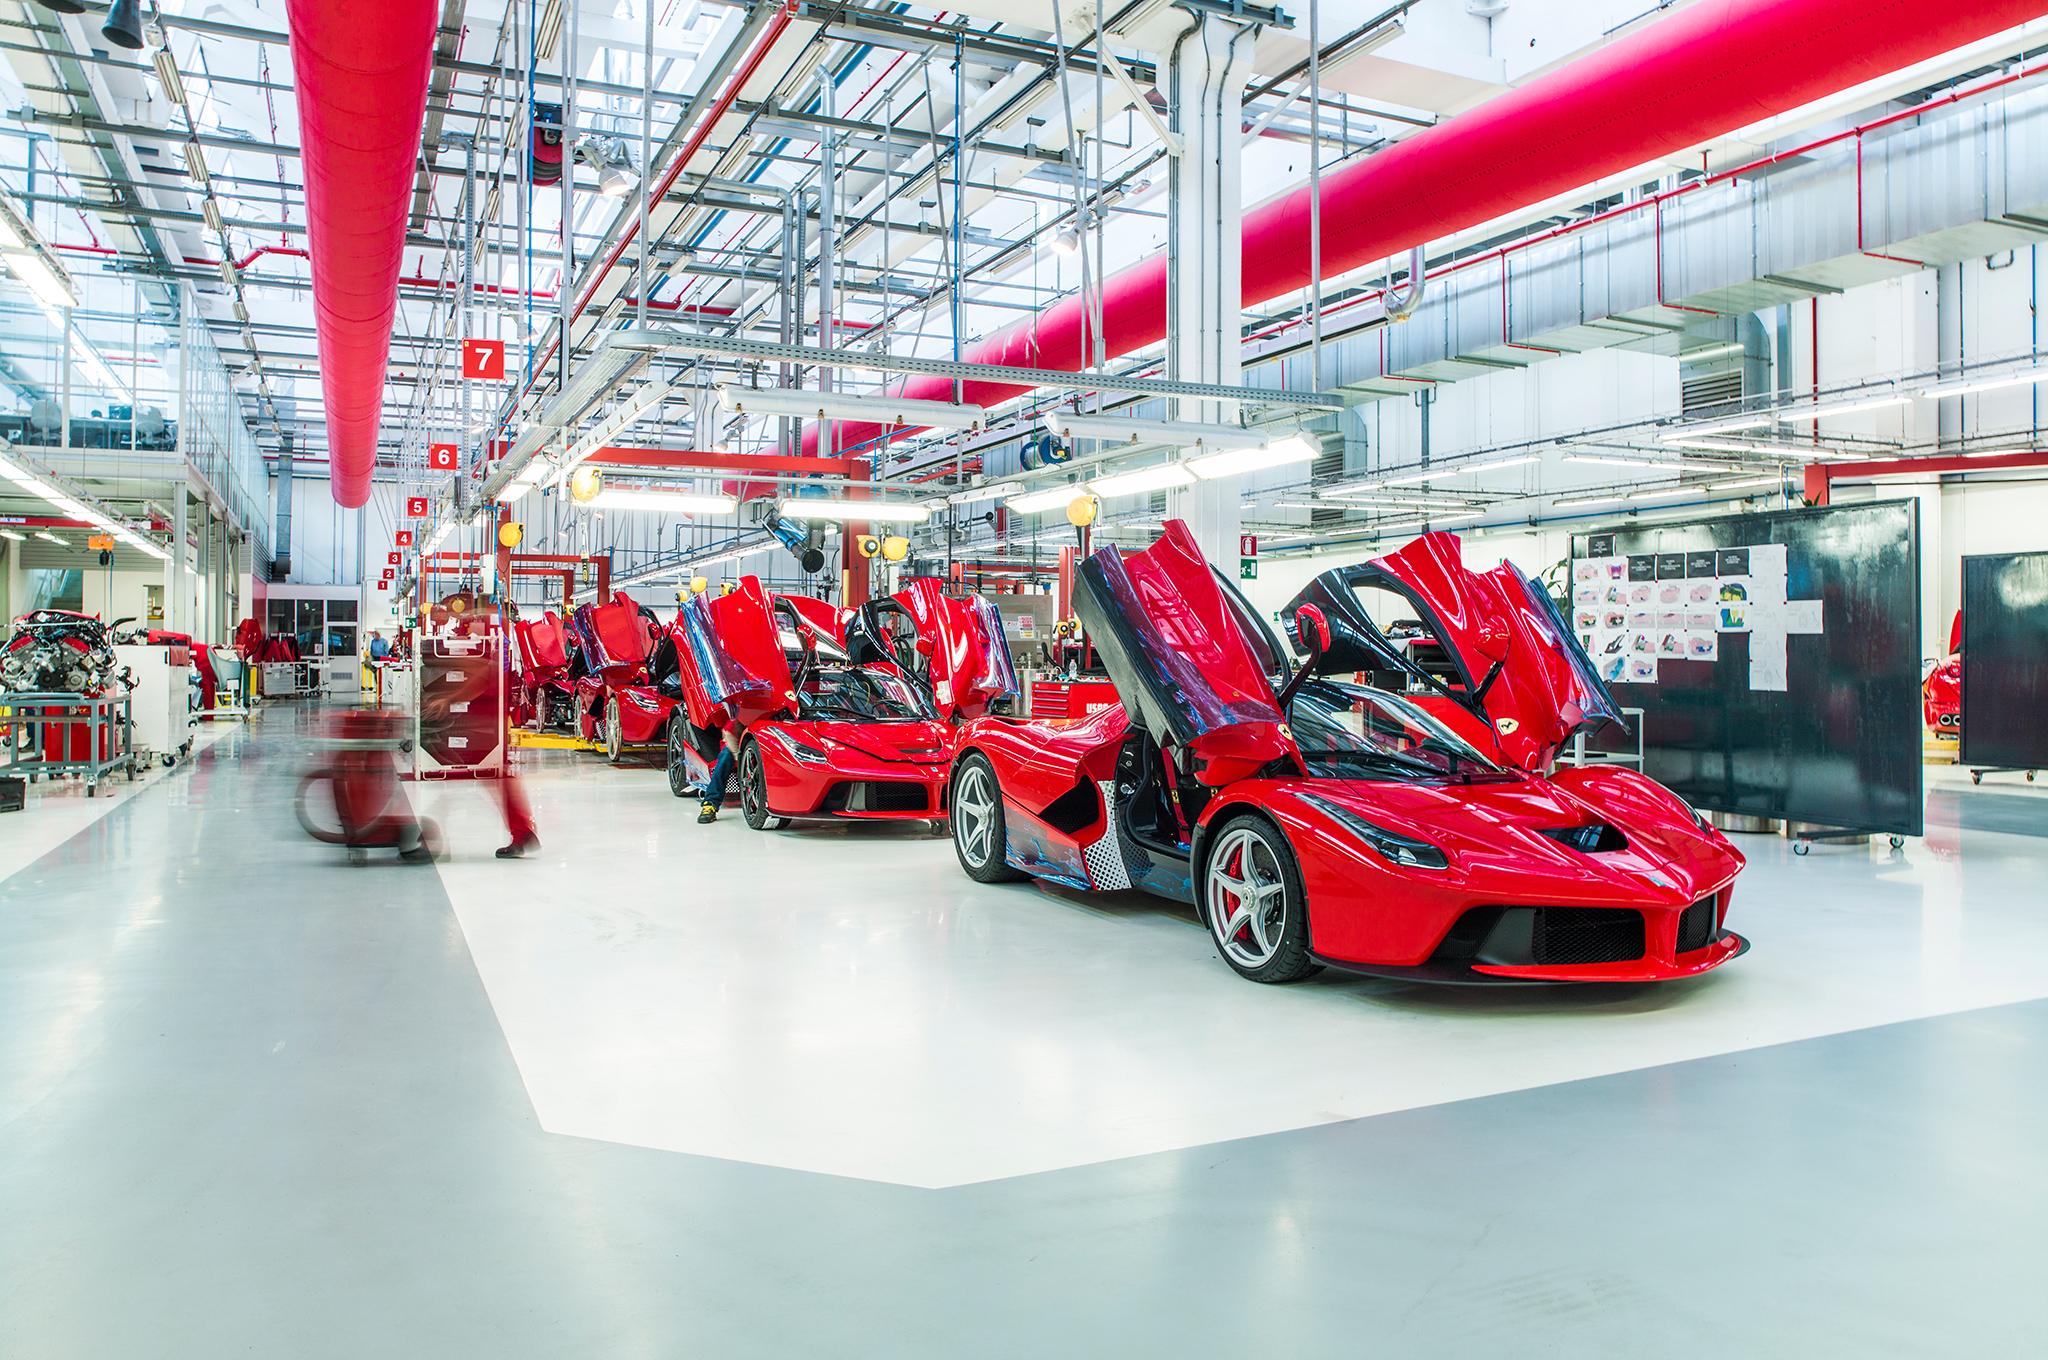 23+ Ferrari Hd Wallpaper Theme Pack  Pictures